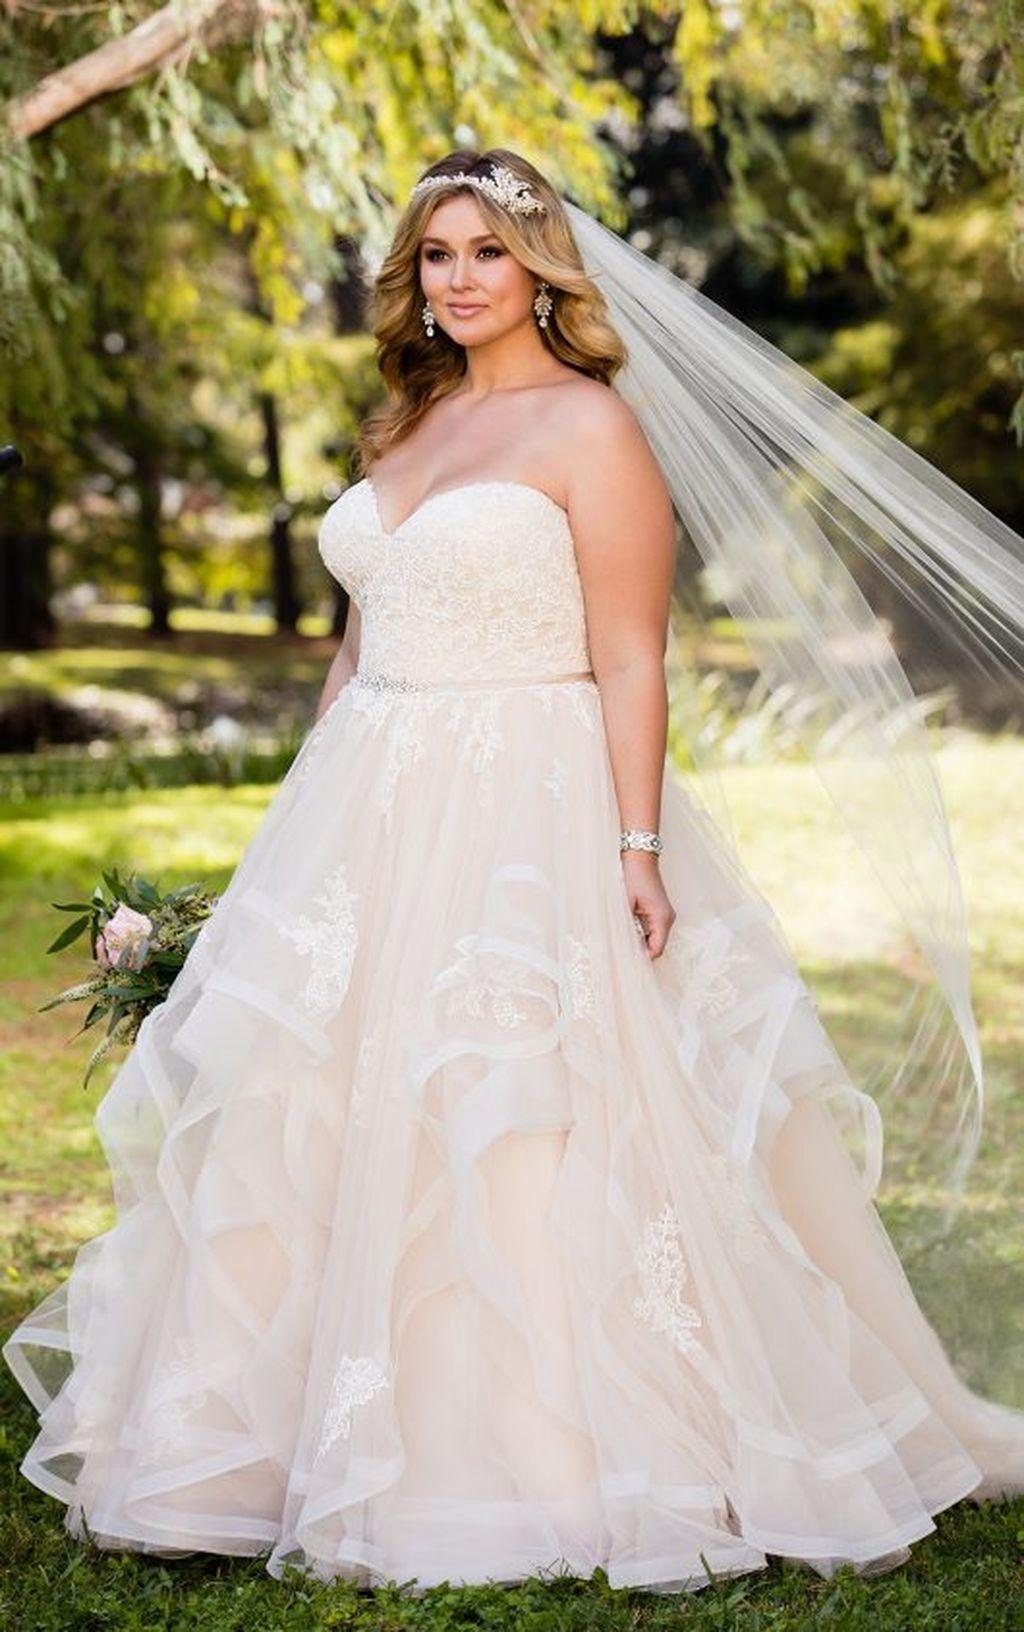 Stunning Plus Size Winter Wedding Dress Ideas with Lace  Dress